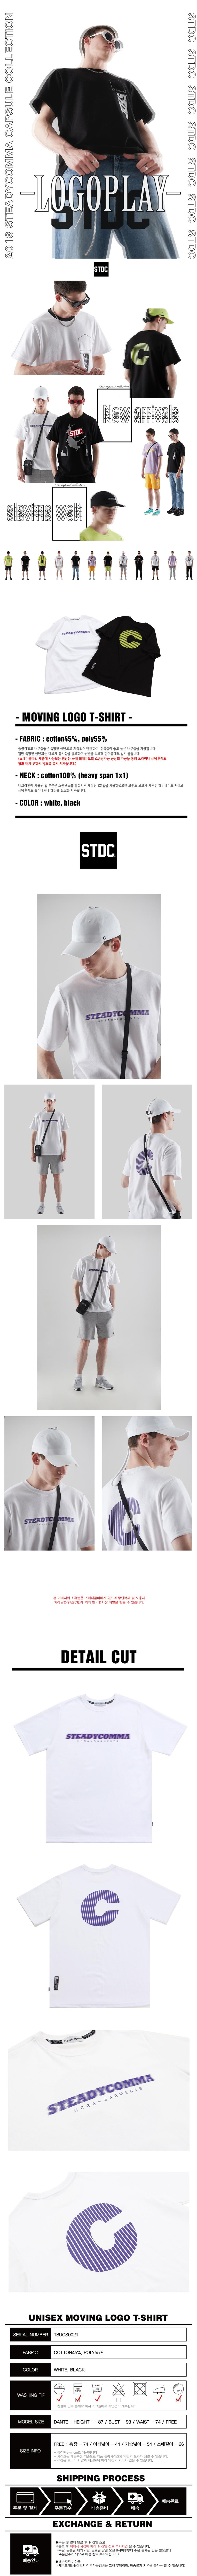 MOVING LOGO T-SHIRTS WHITE.jpg